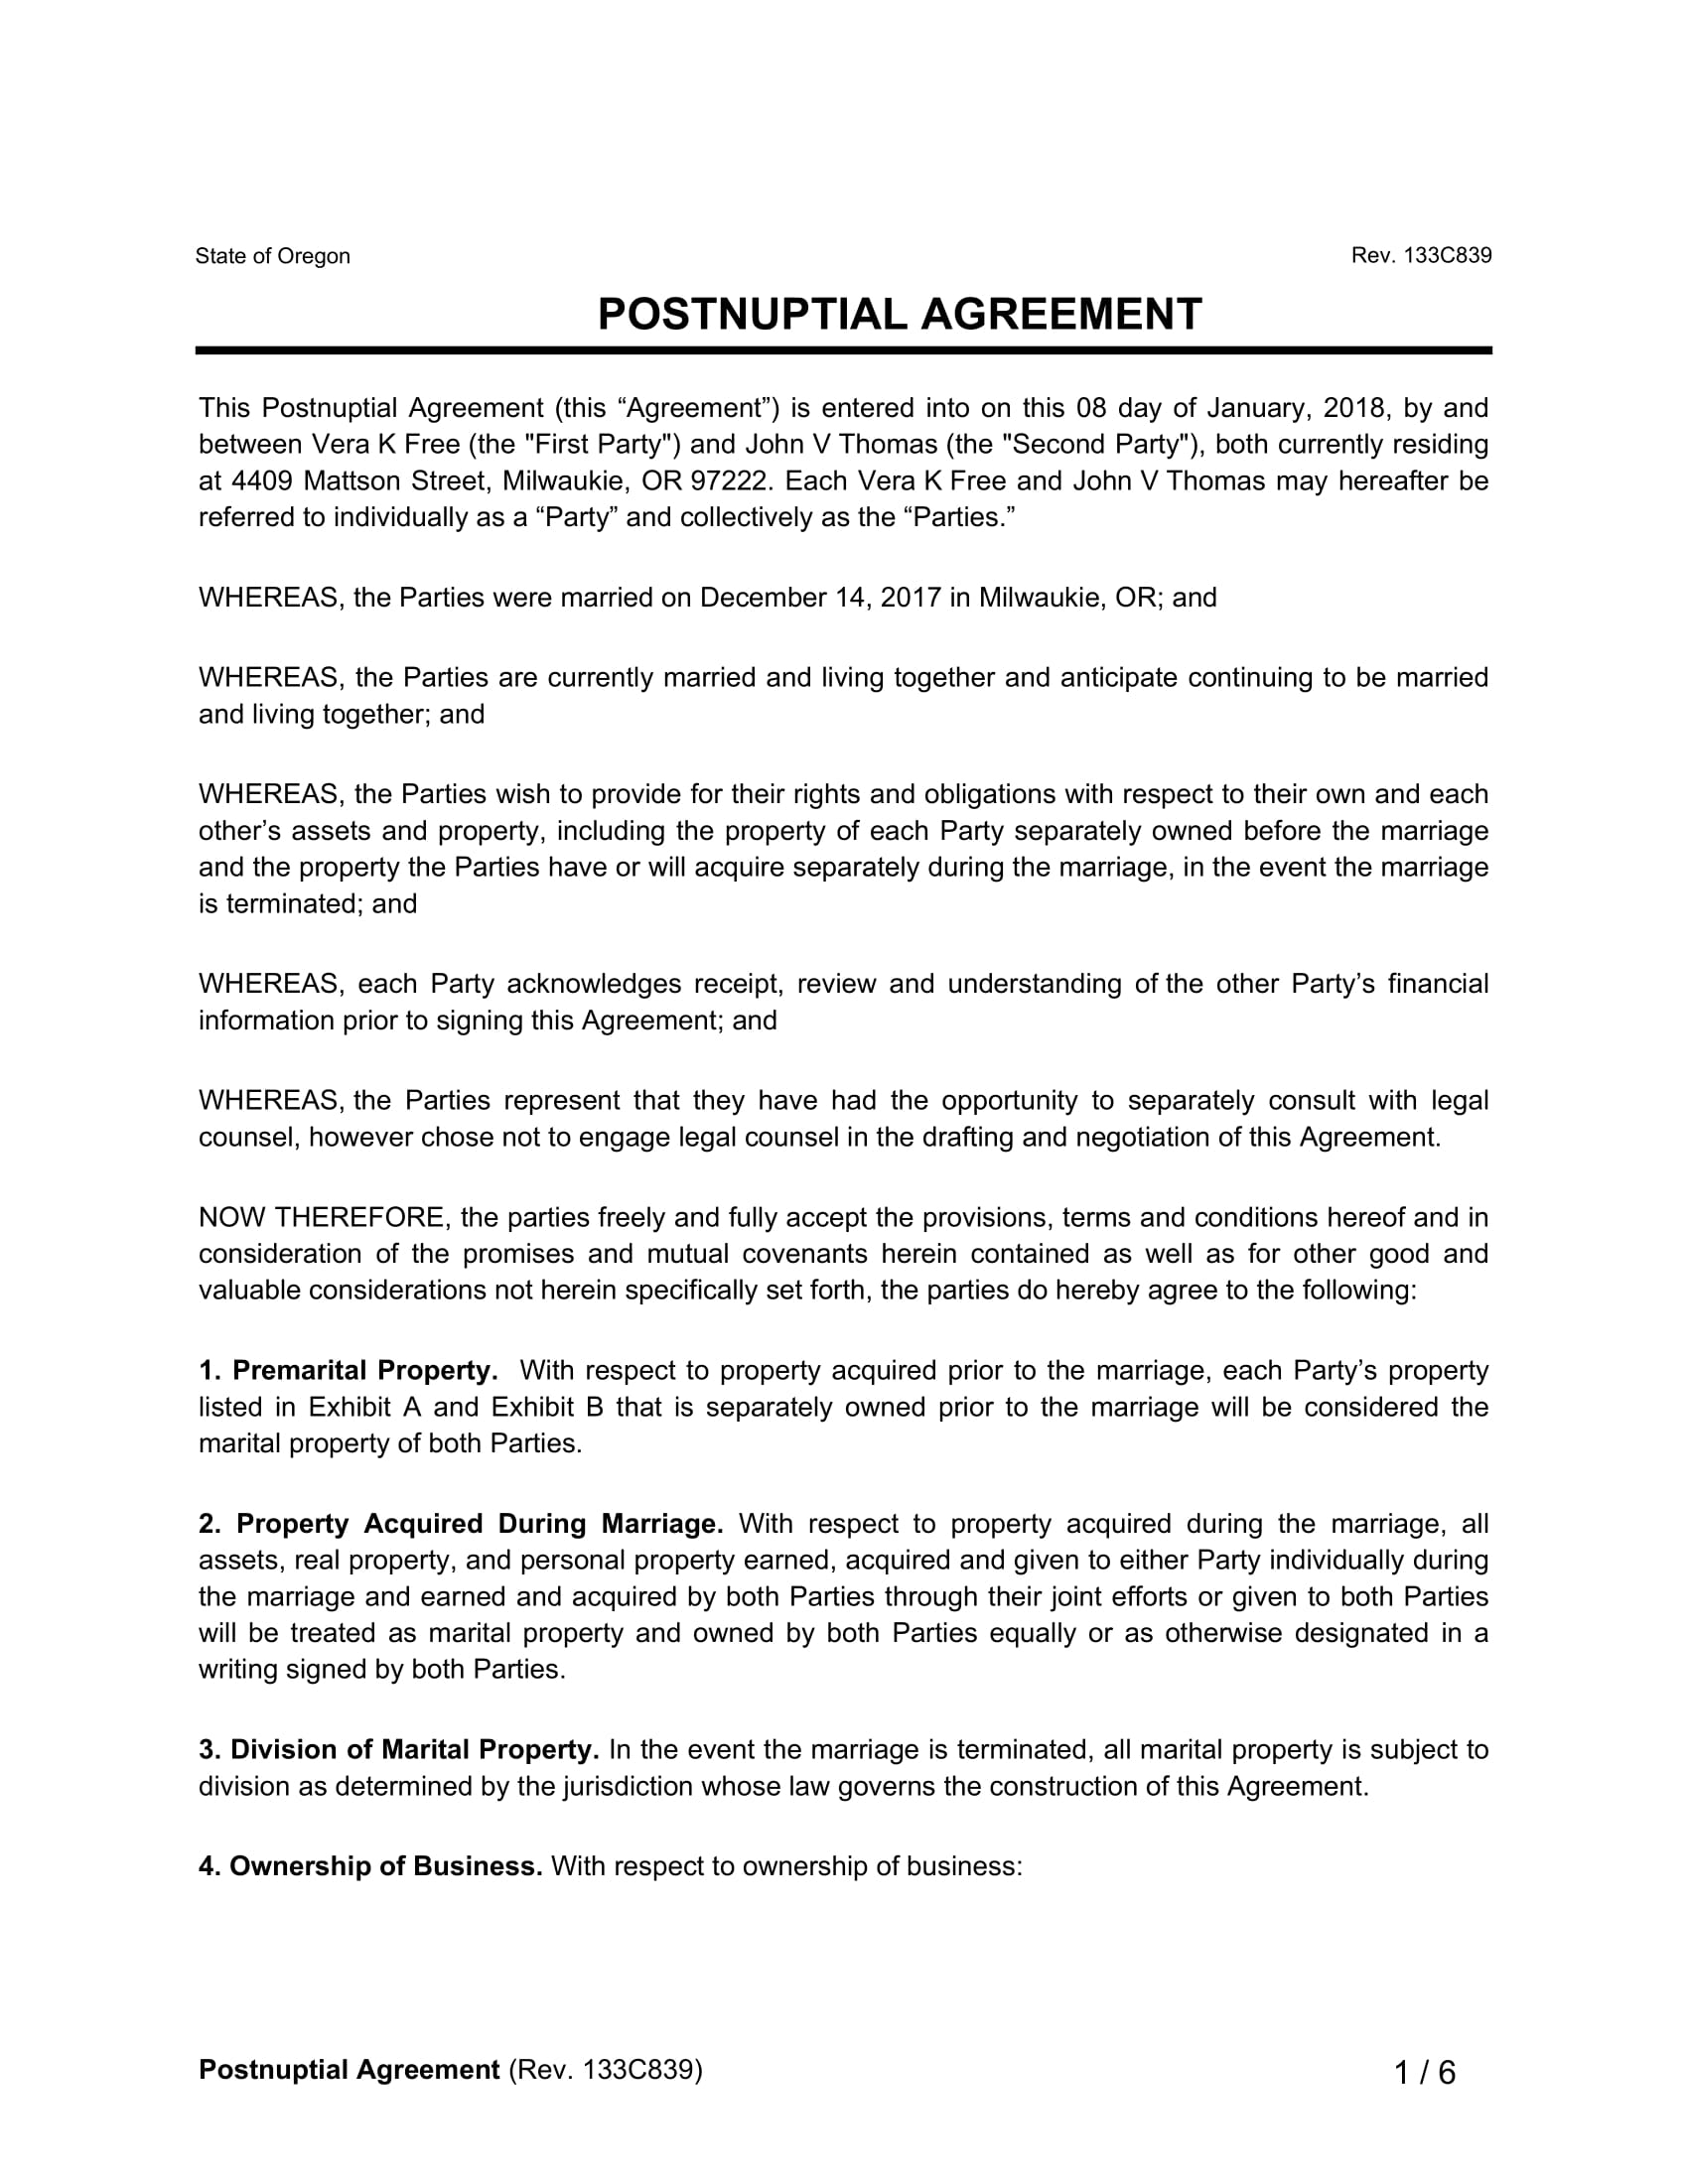 Postnuptial Agreement Form Ibovnathandedecker